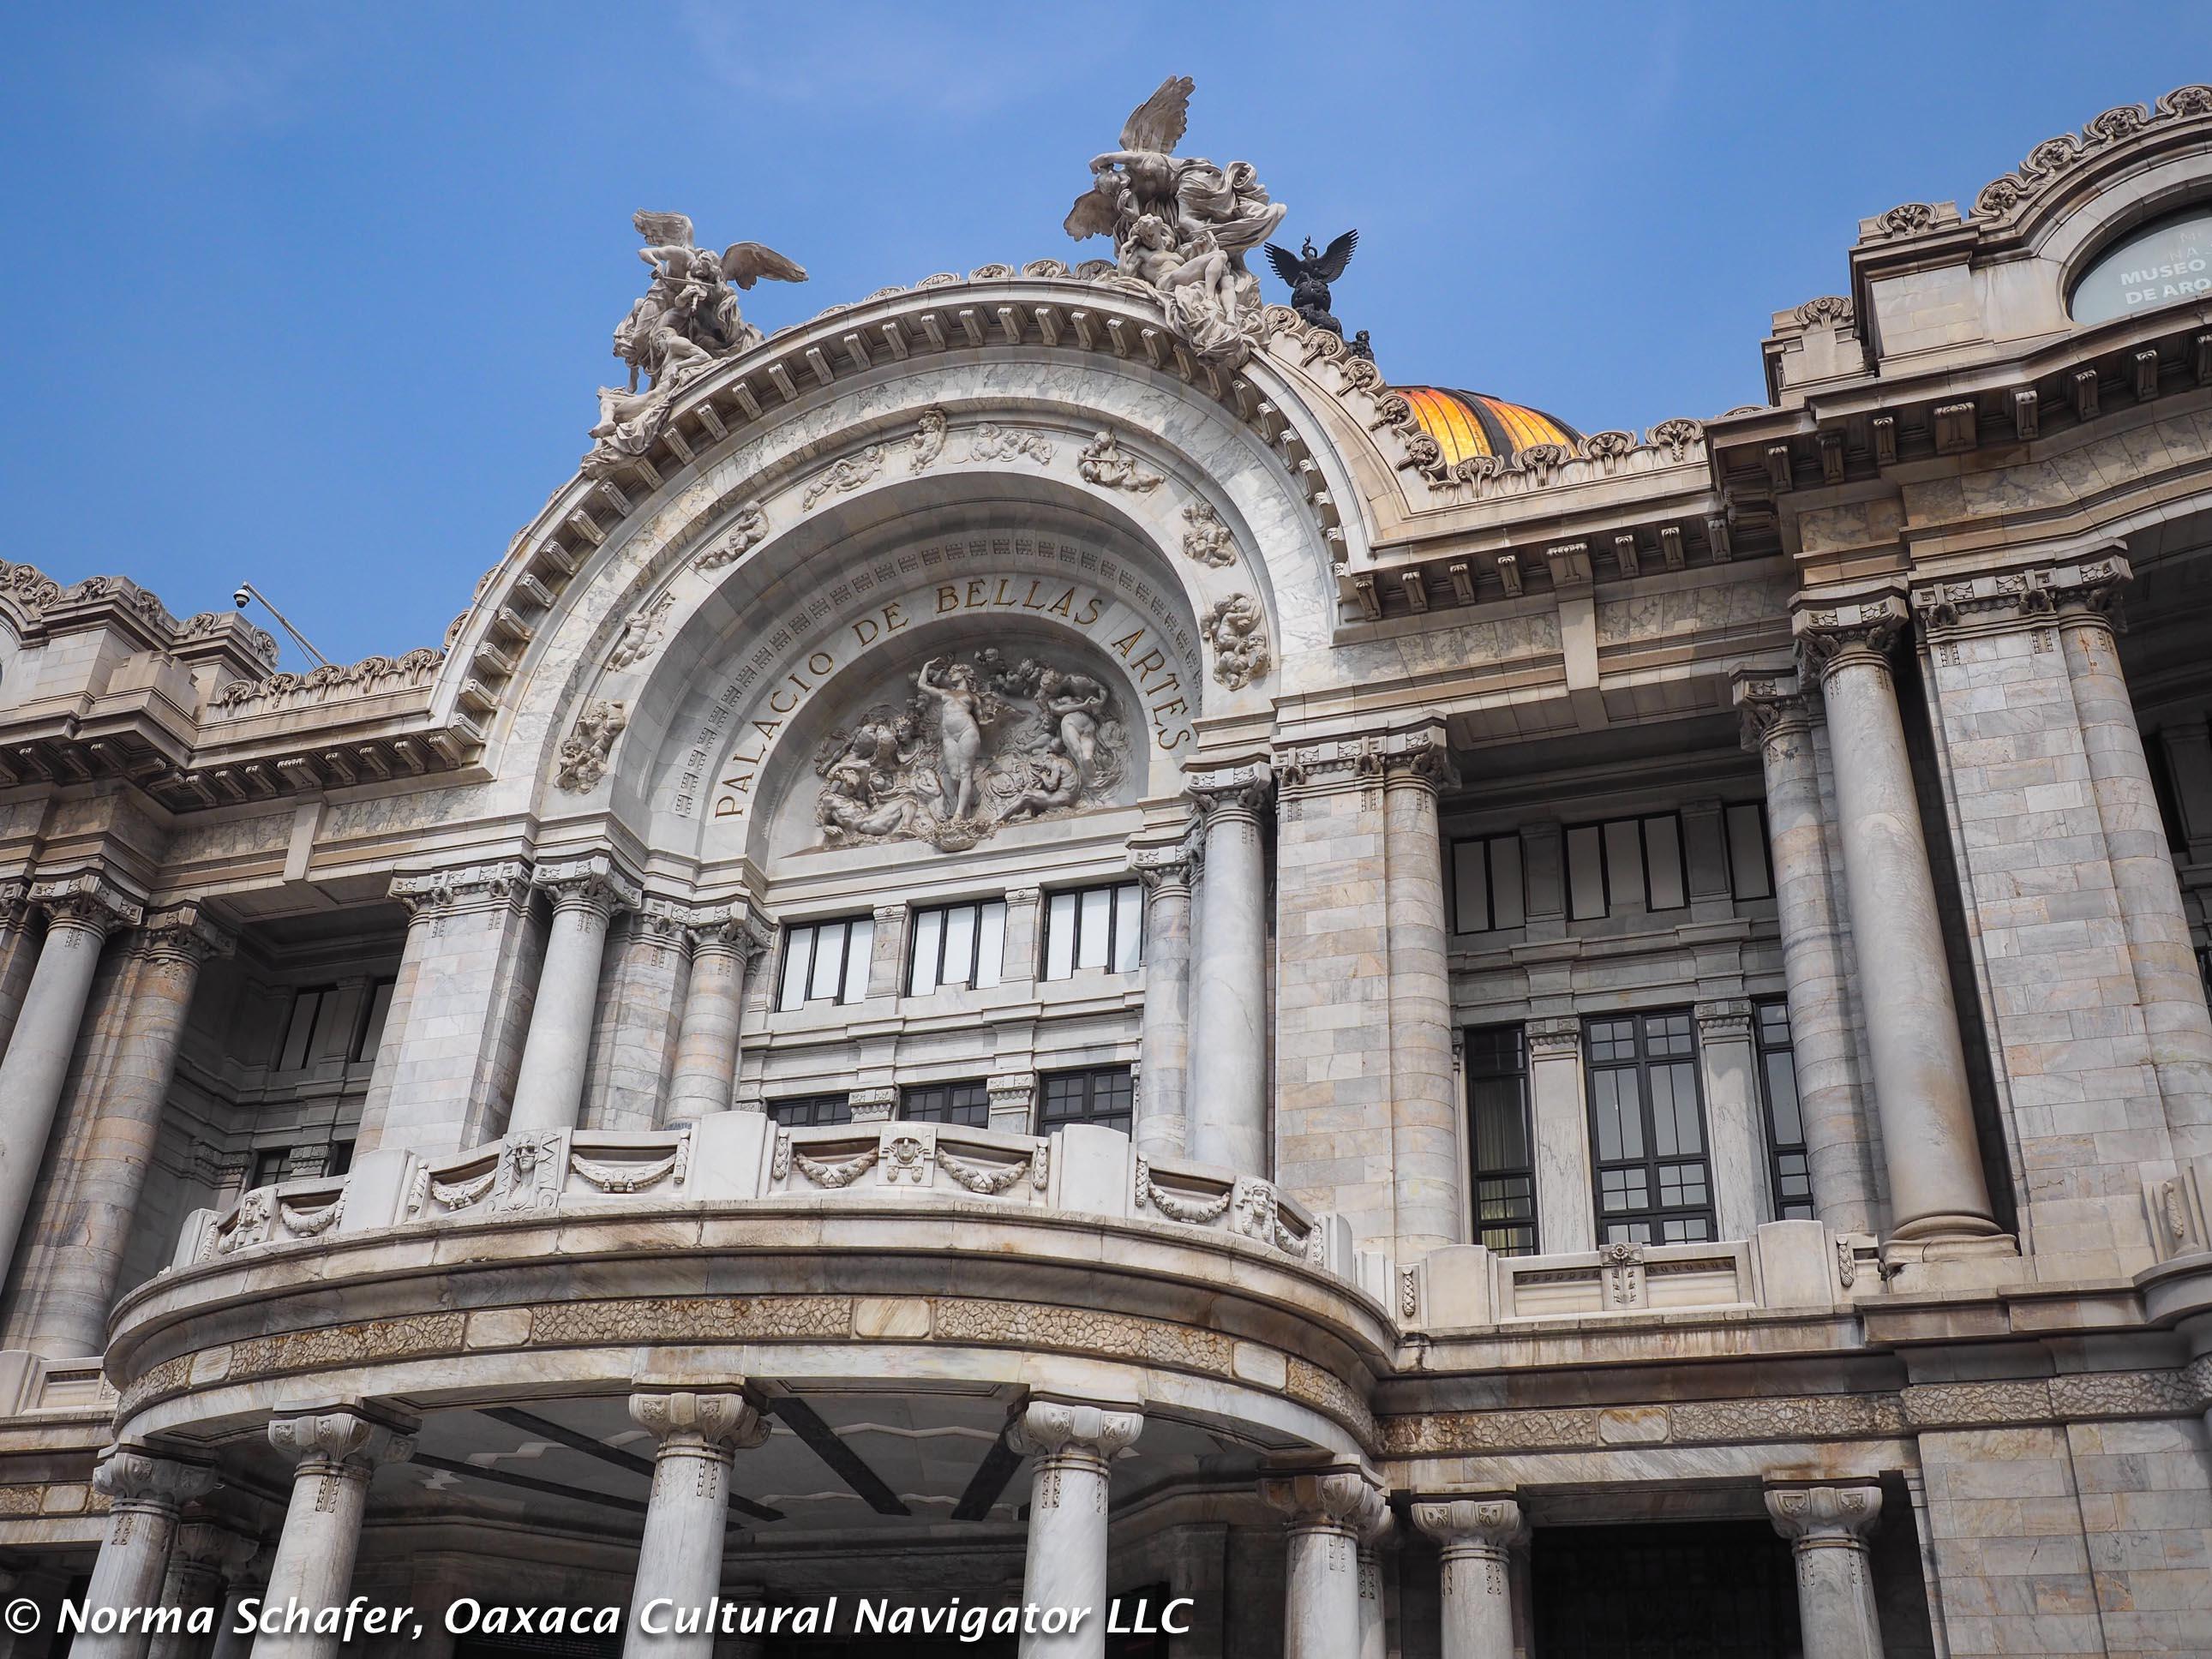 Palacio Bellas Artes built during Porfirio Diaz presidency